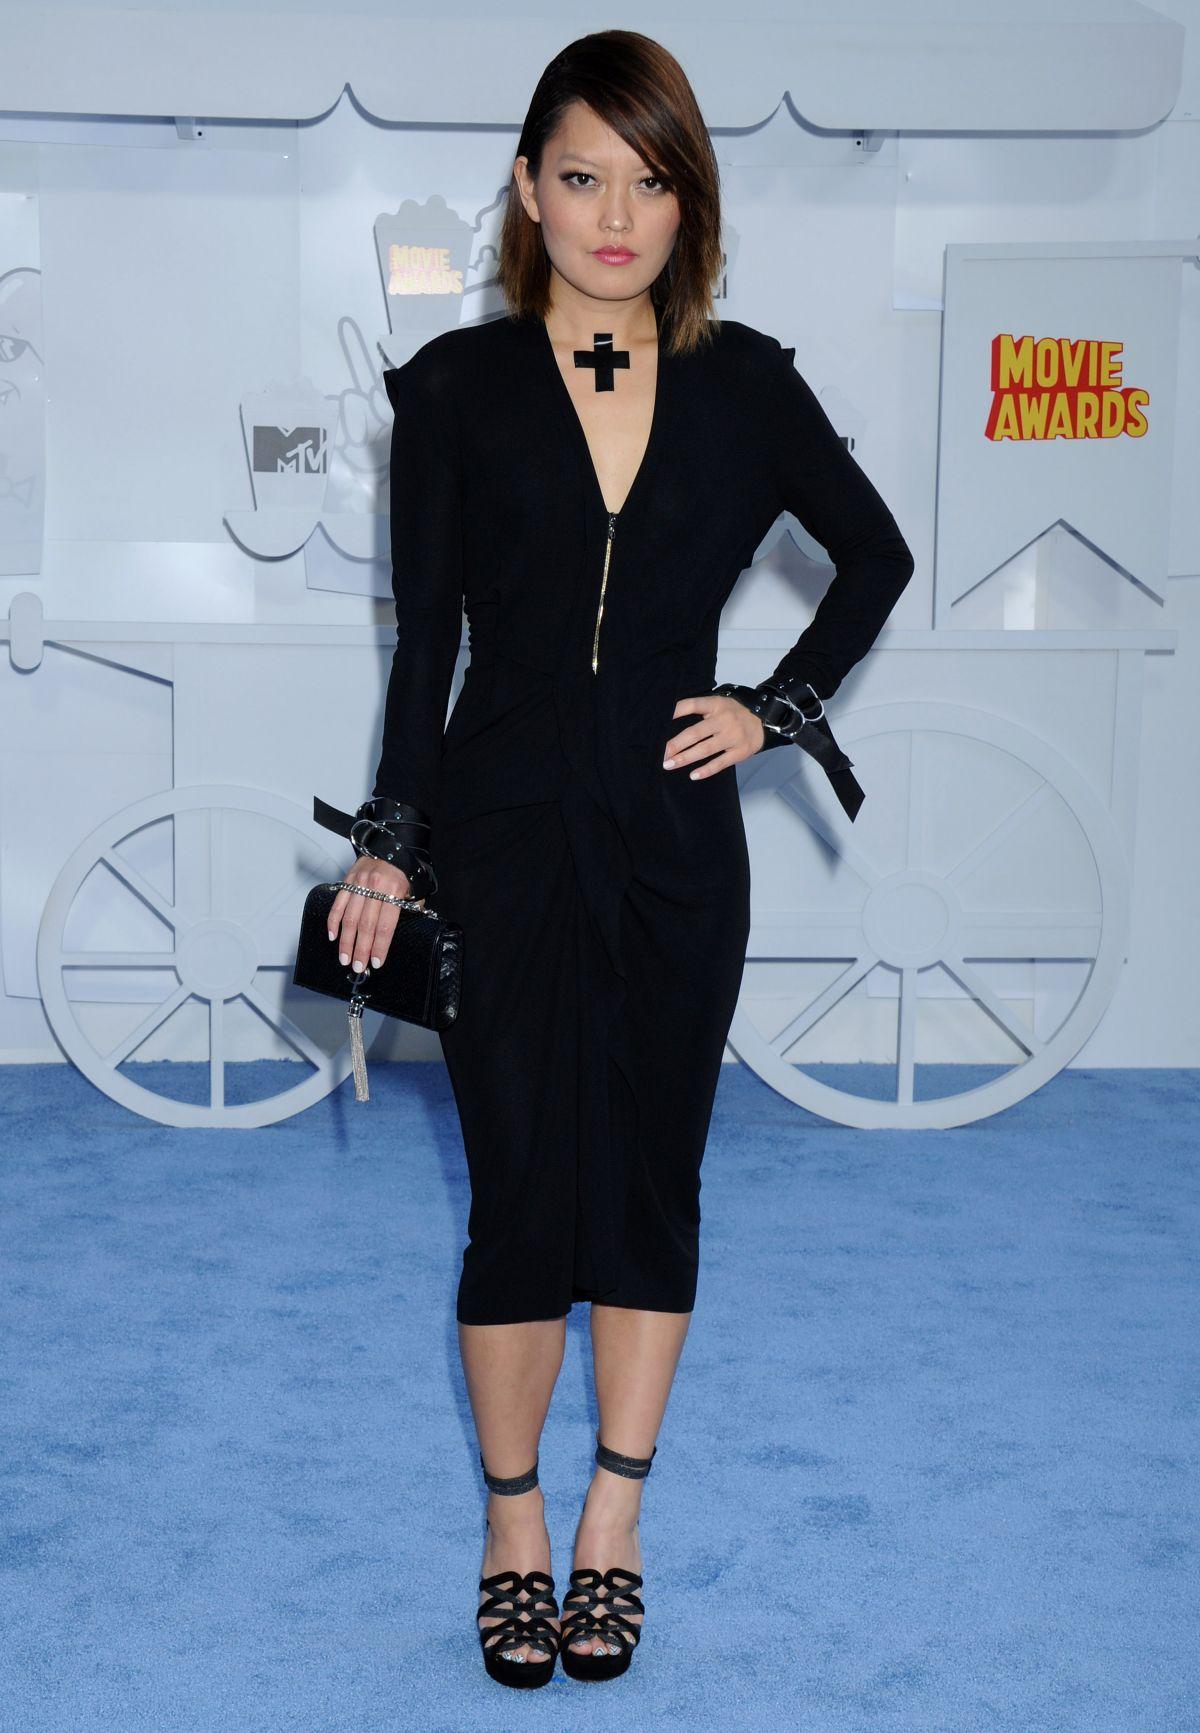 HANA MAE LEE at 2015 MTV Movie Awards in Los Angeles